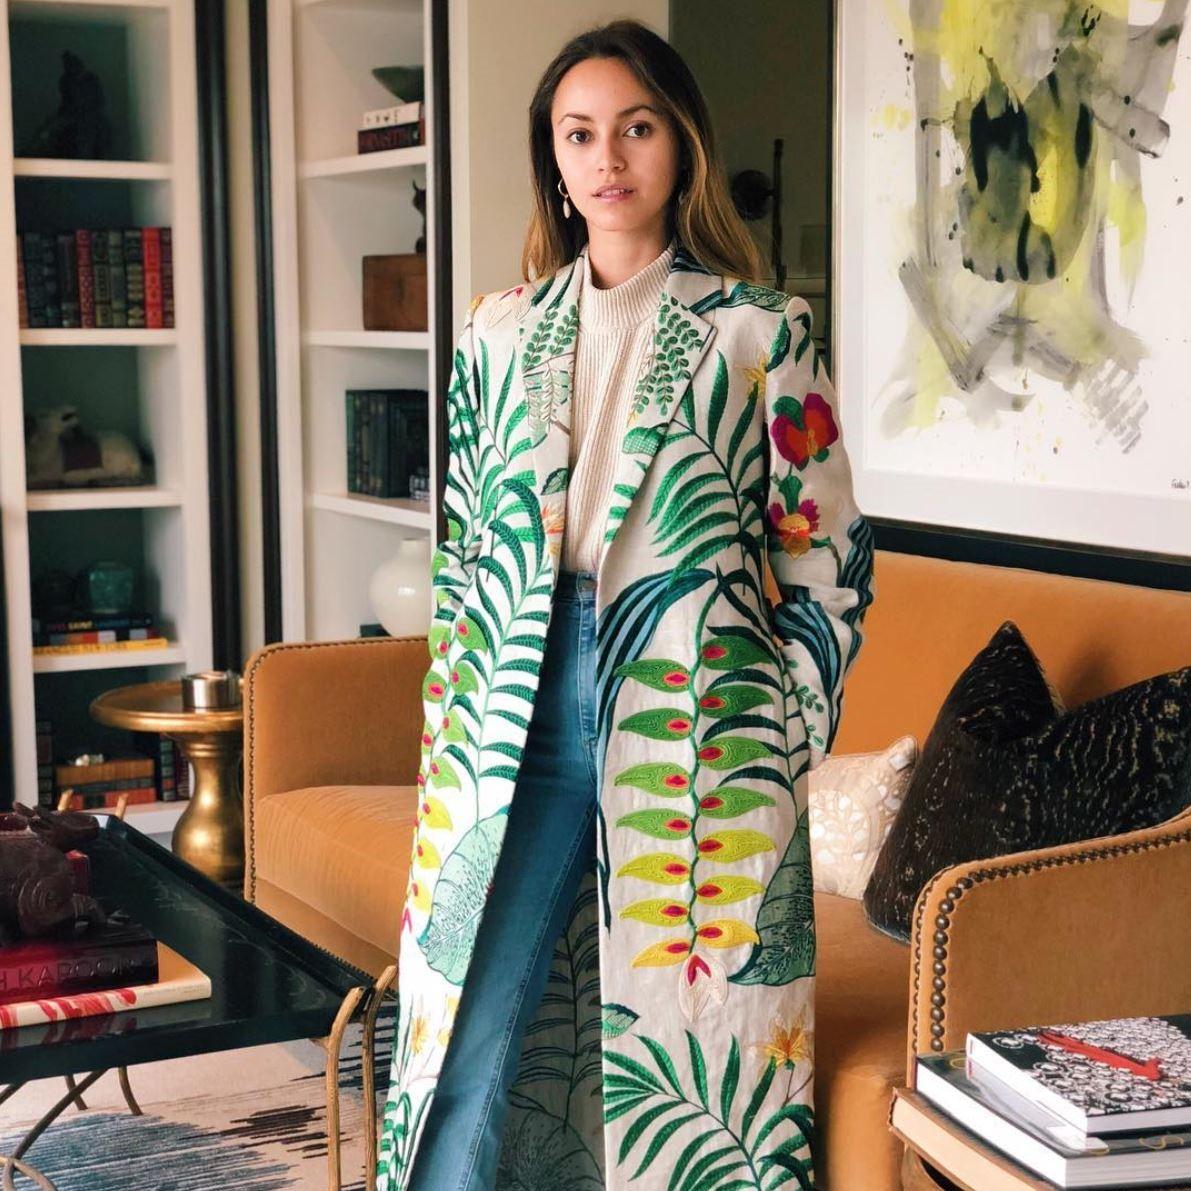 KATRINA RAZON - Heliconias Kimono  #DJ #ManagingPartnerKSR #almagirl #girlboss  @ Her Apartment in LA